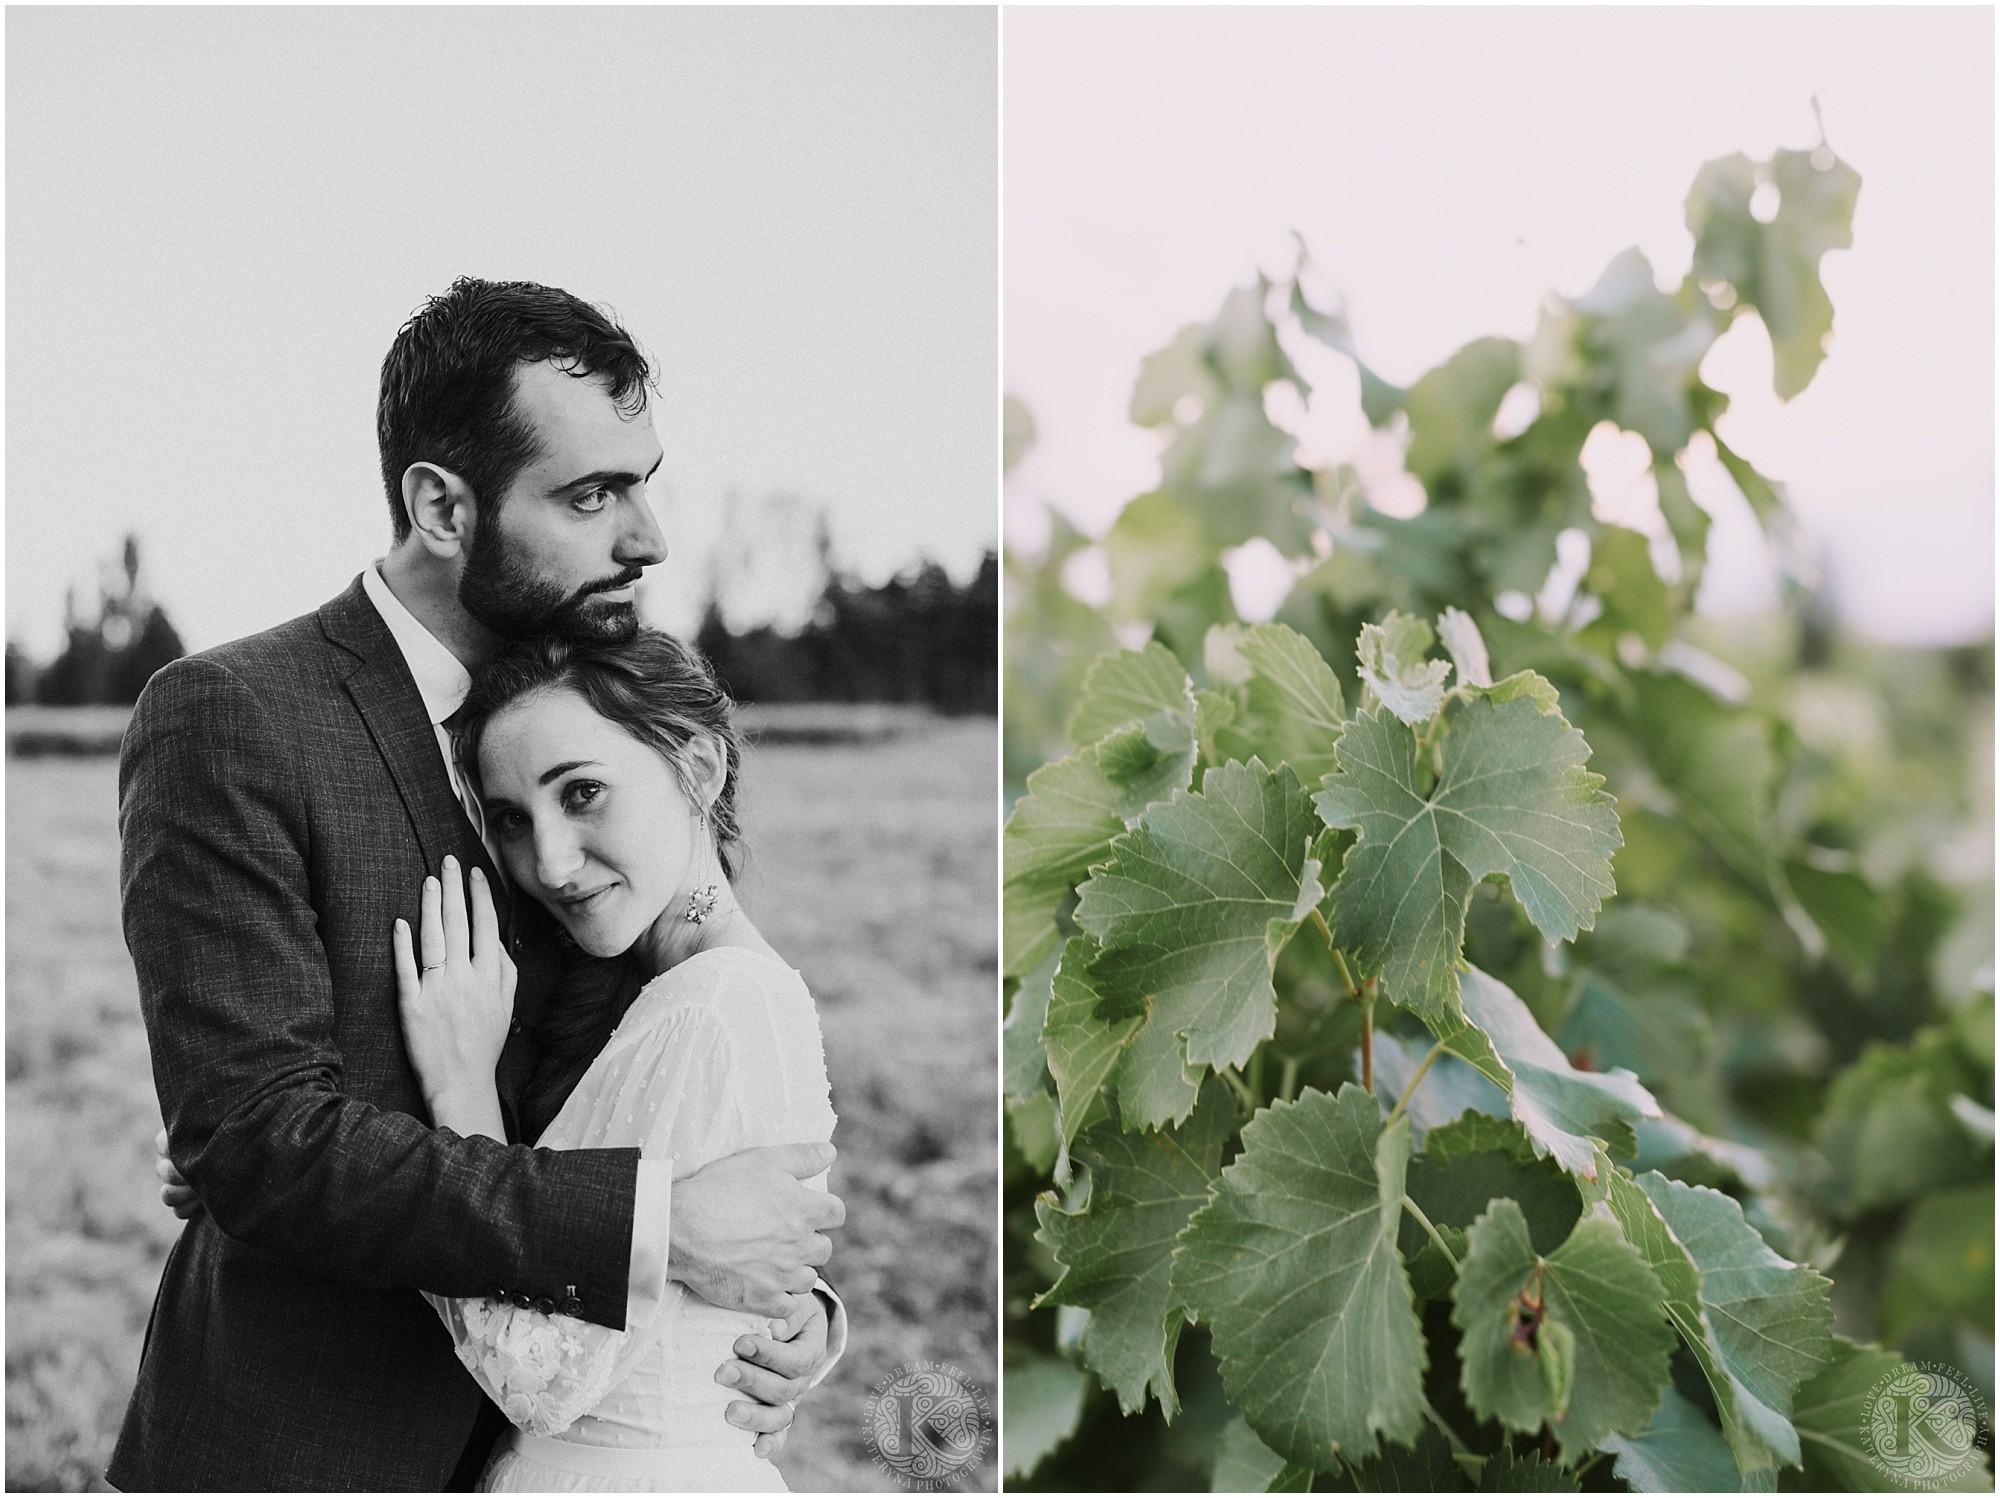 Kateryna-photos-photographe-mariage-vaucluse-provence-avignon-ferme-st-hugues_0078.jpg